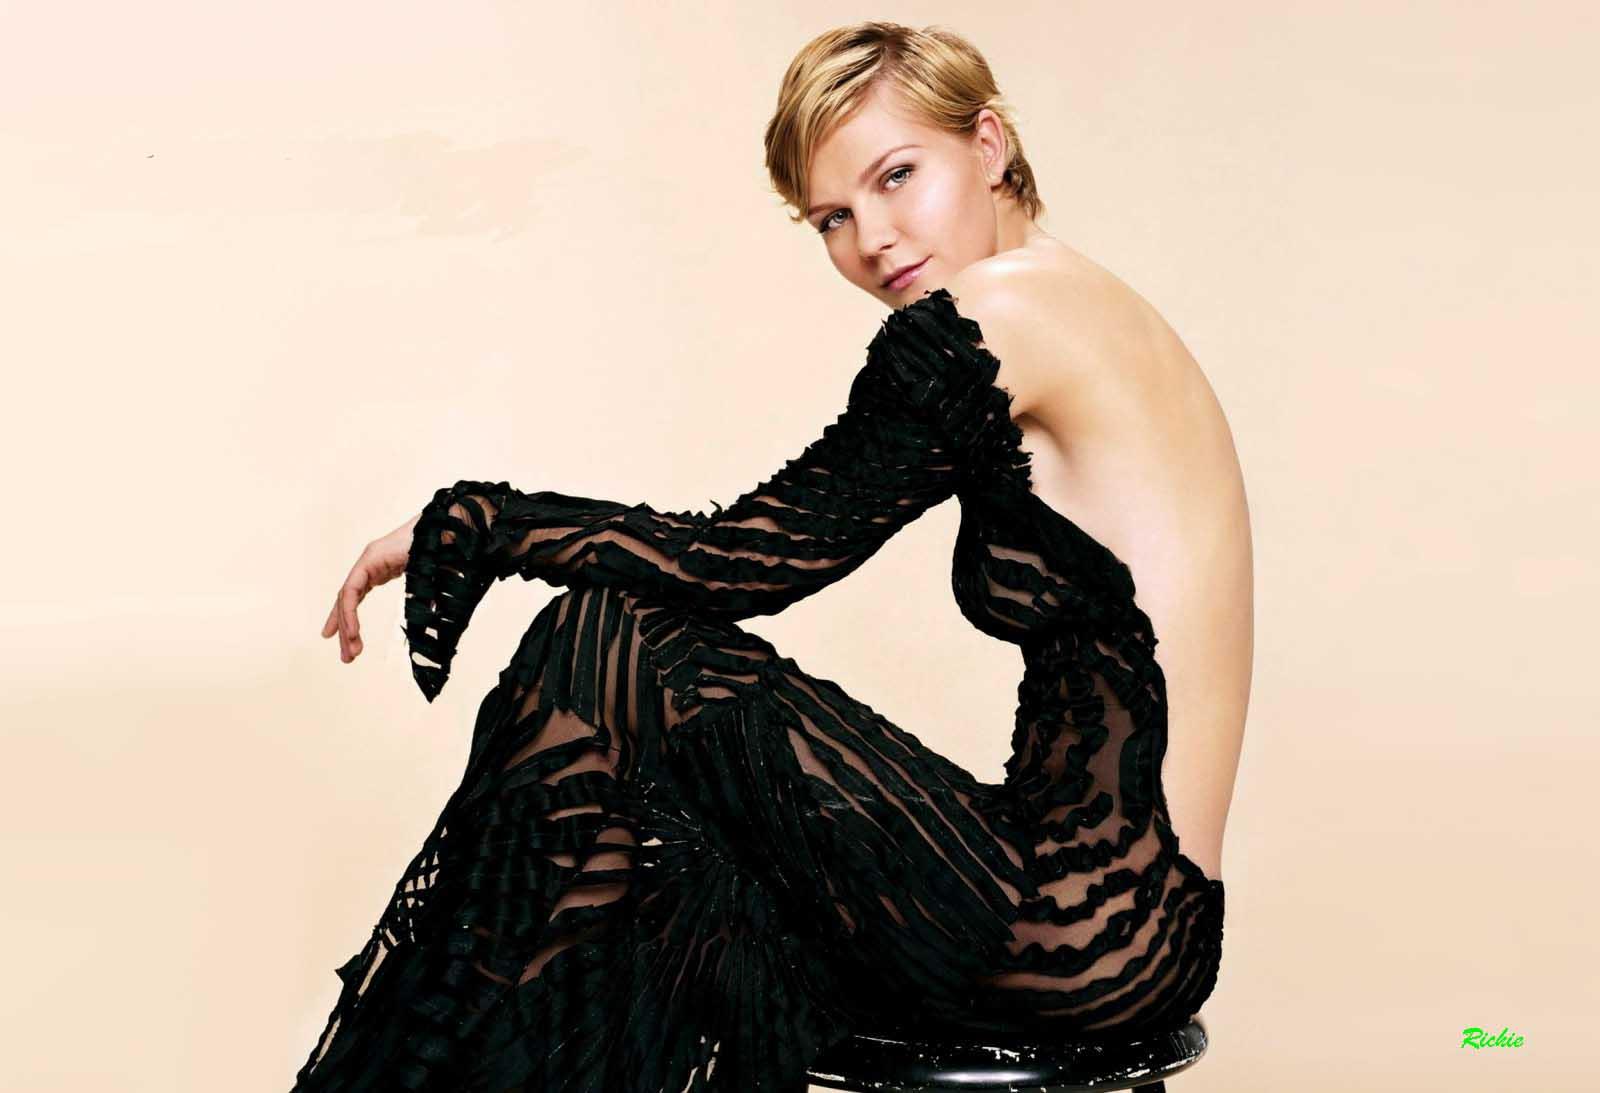 http://1.bp.blogspot.com/_BpAoKRSdVjQ/TRrNa8NlzJI/AAAAAAAAD-M/kE4lKoTbM6Y/s1600/kirsten-dunst-spiderman-actress.jpg